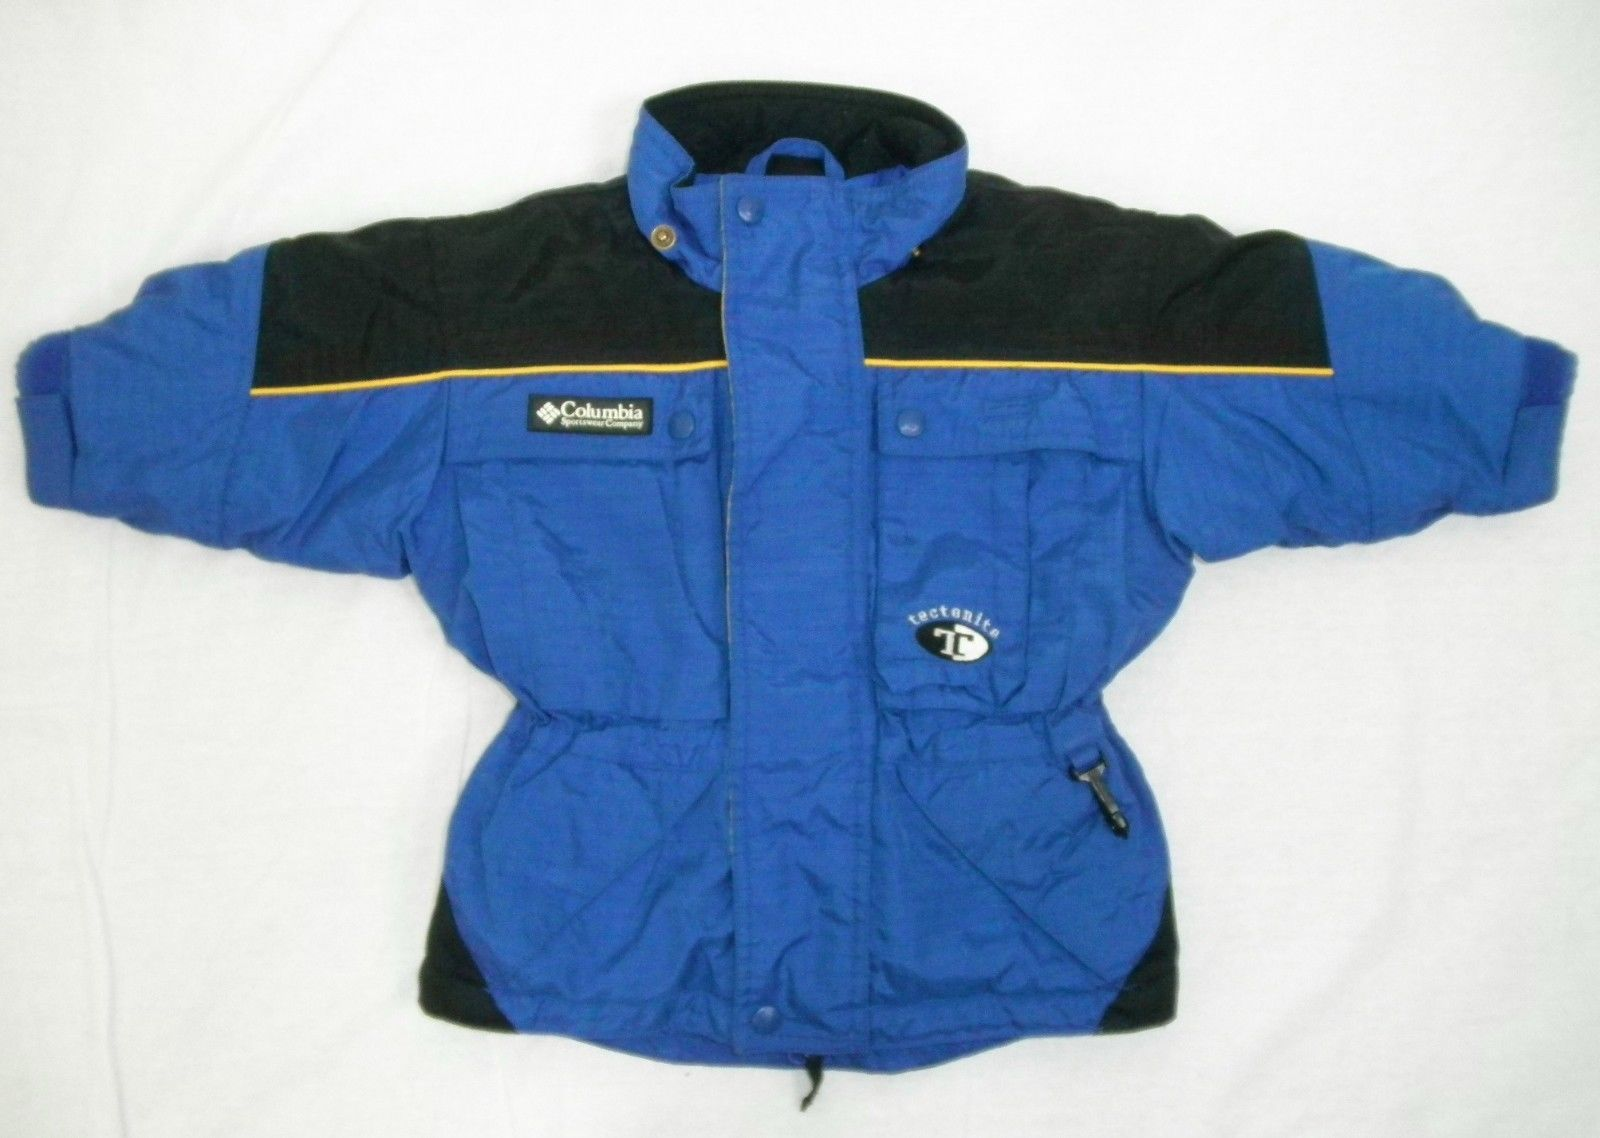 25e8e0f601e4 Columbia Blue Quilted Warm Winter Ski Jacket and 50 similar items